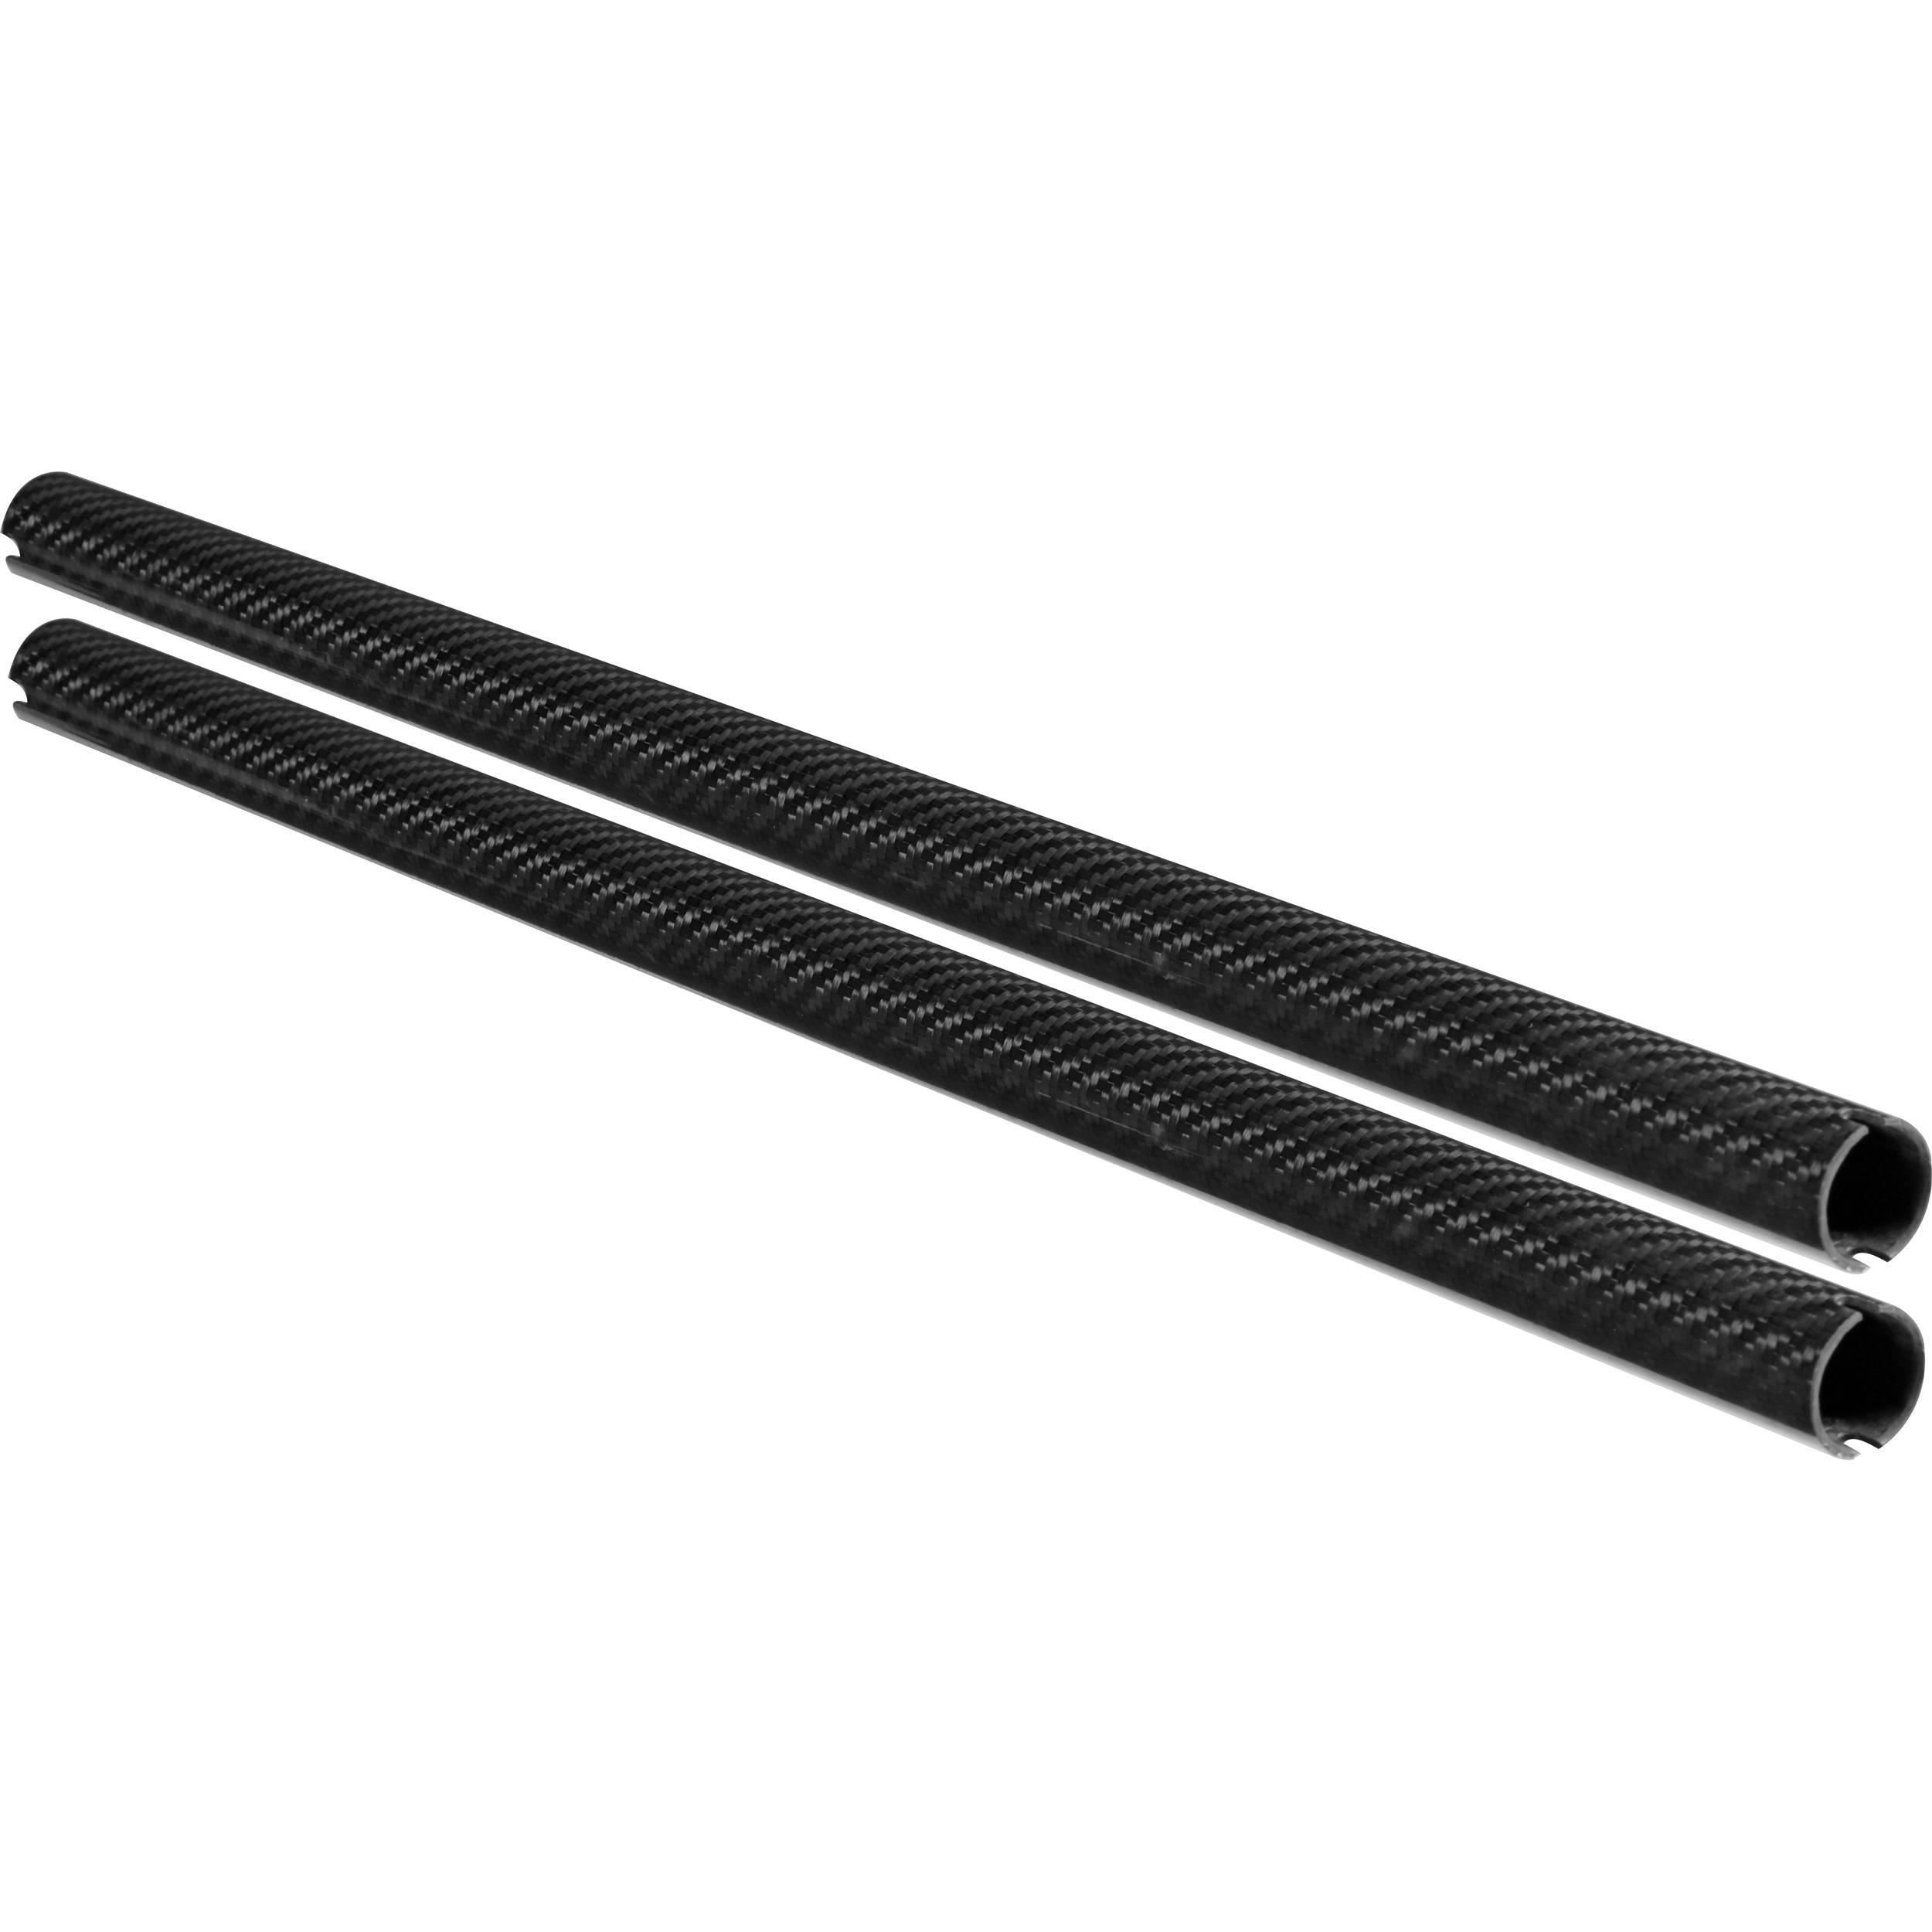 CineMilled DJI S1000/Ronin-M Extended Carbon Fiber Landing Gear